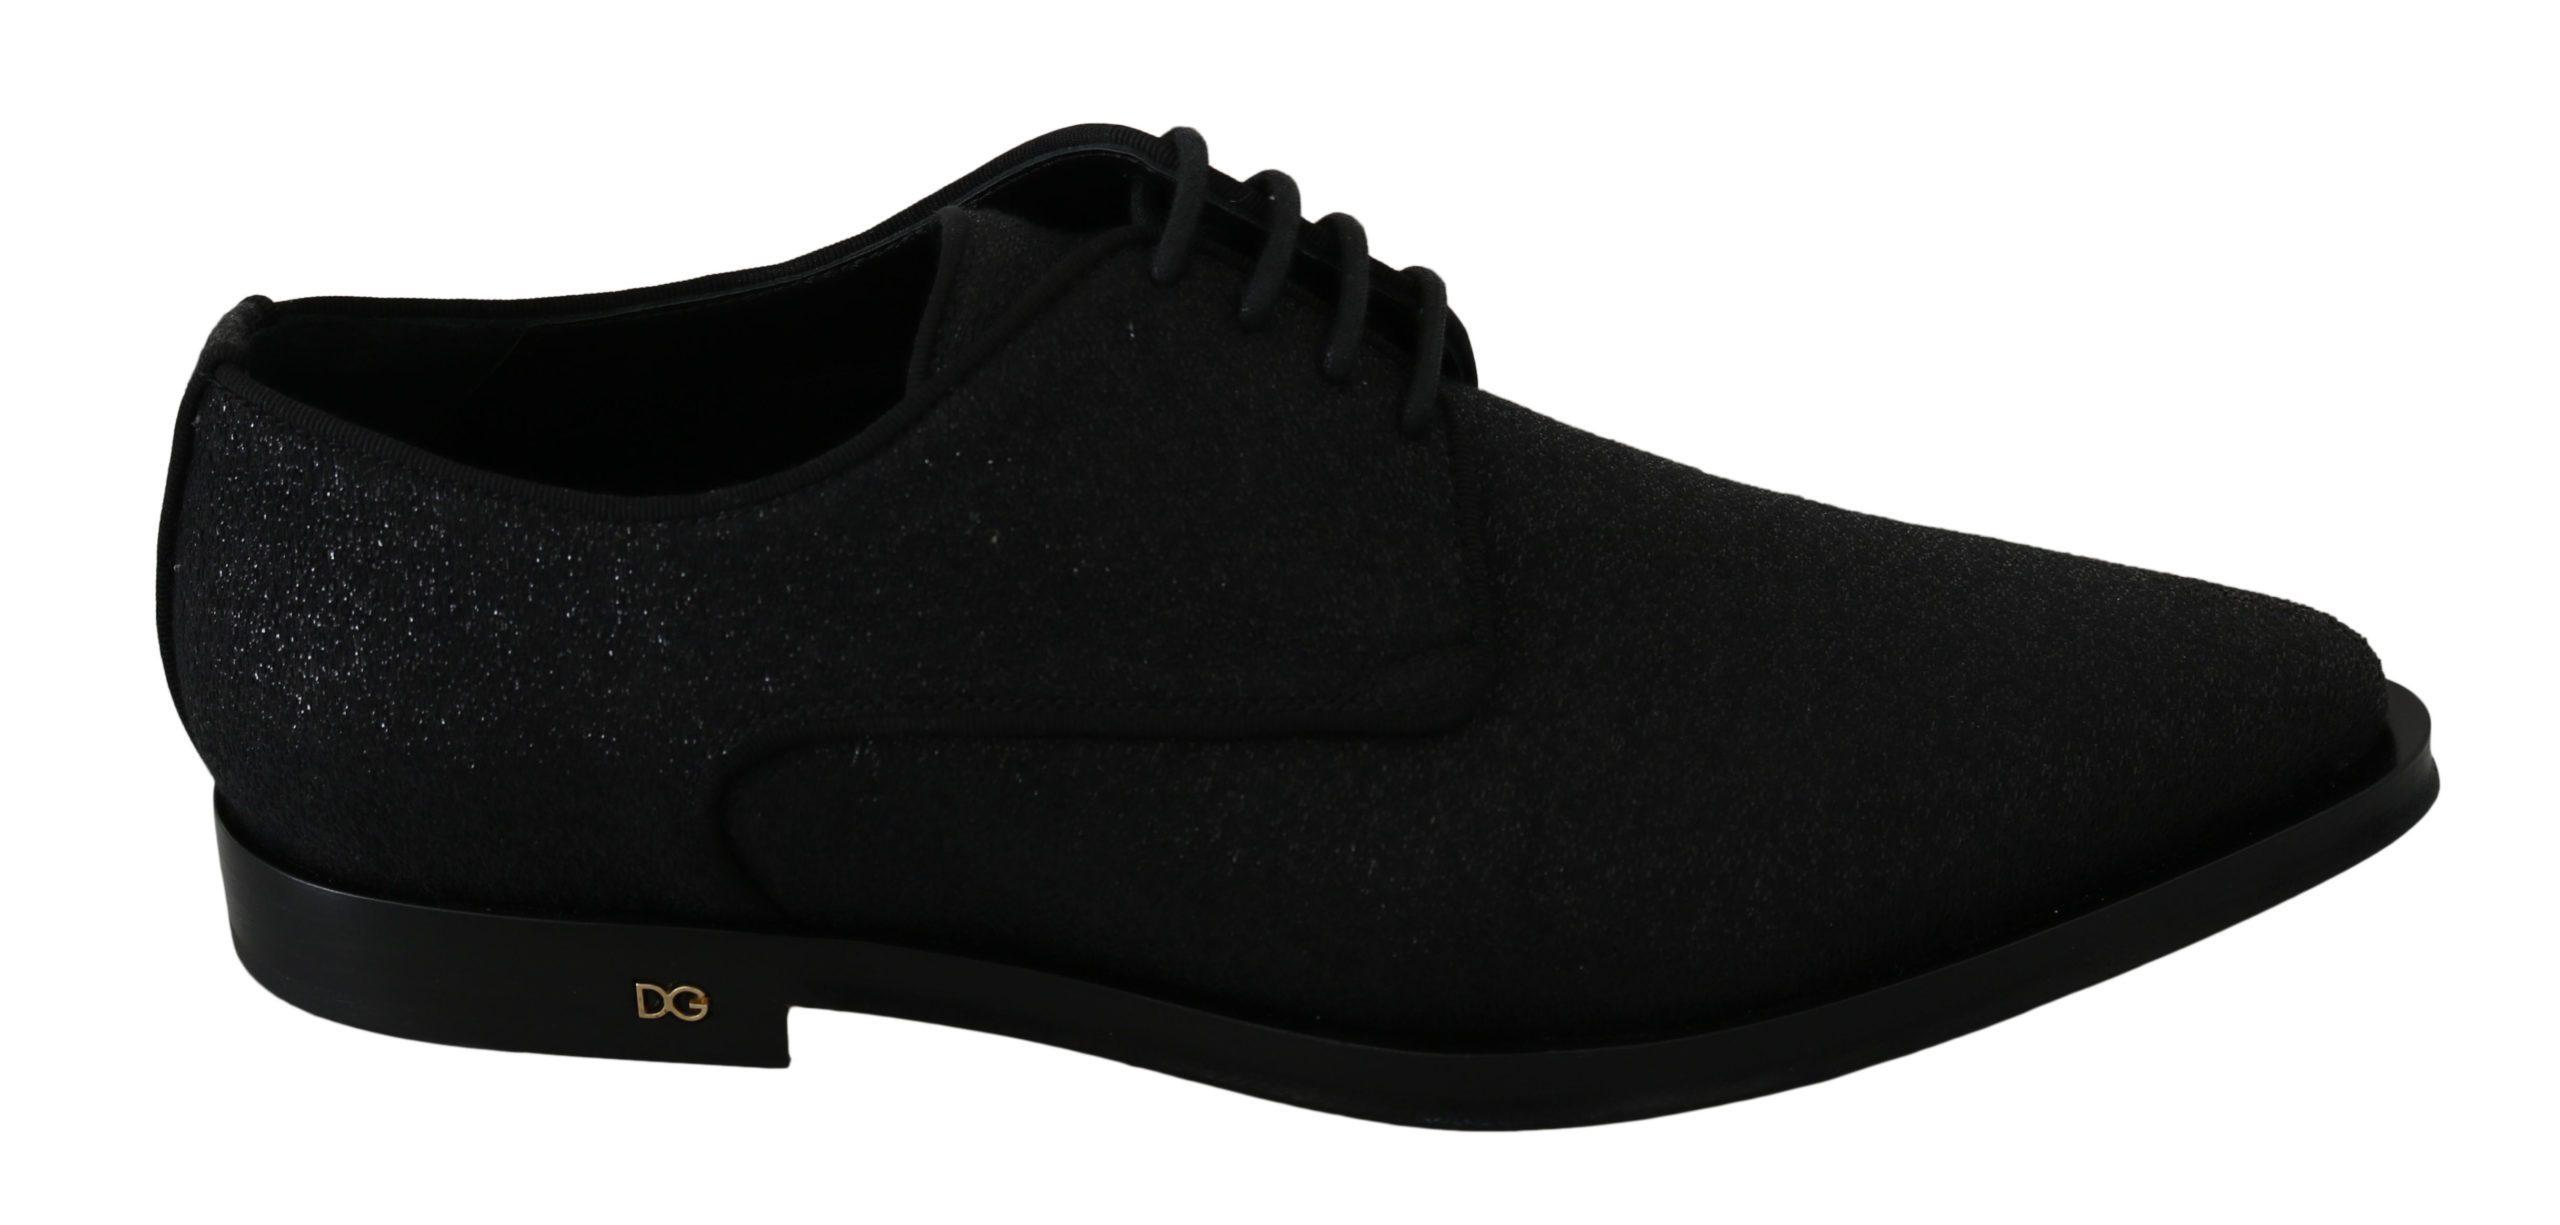 Dolce & Gabbana Women's Glittered Lace Up Leather Flats Black LA7463 - EU39/US8.5